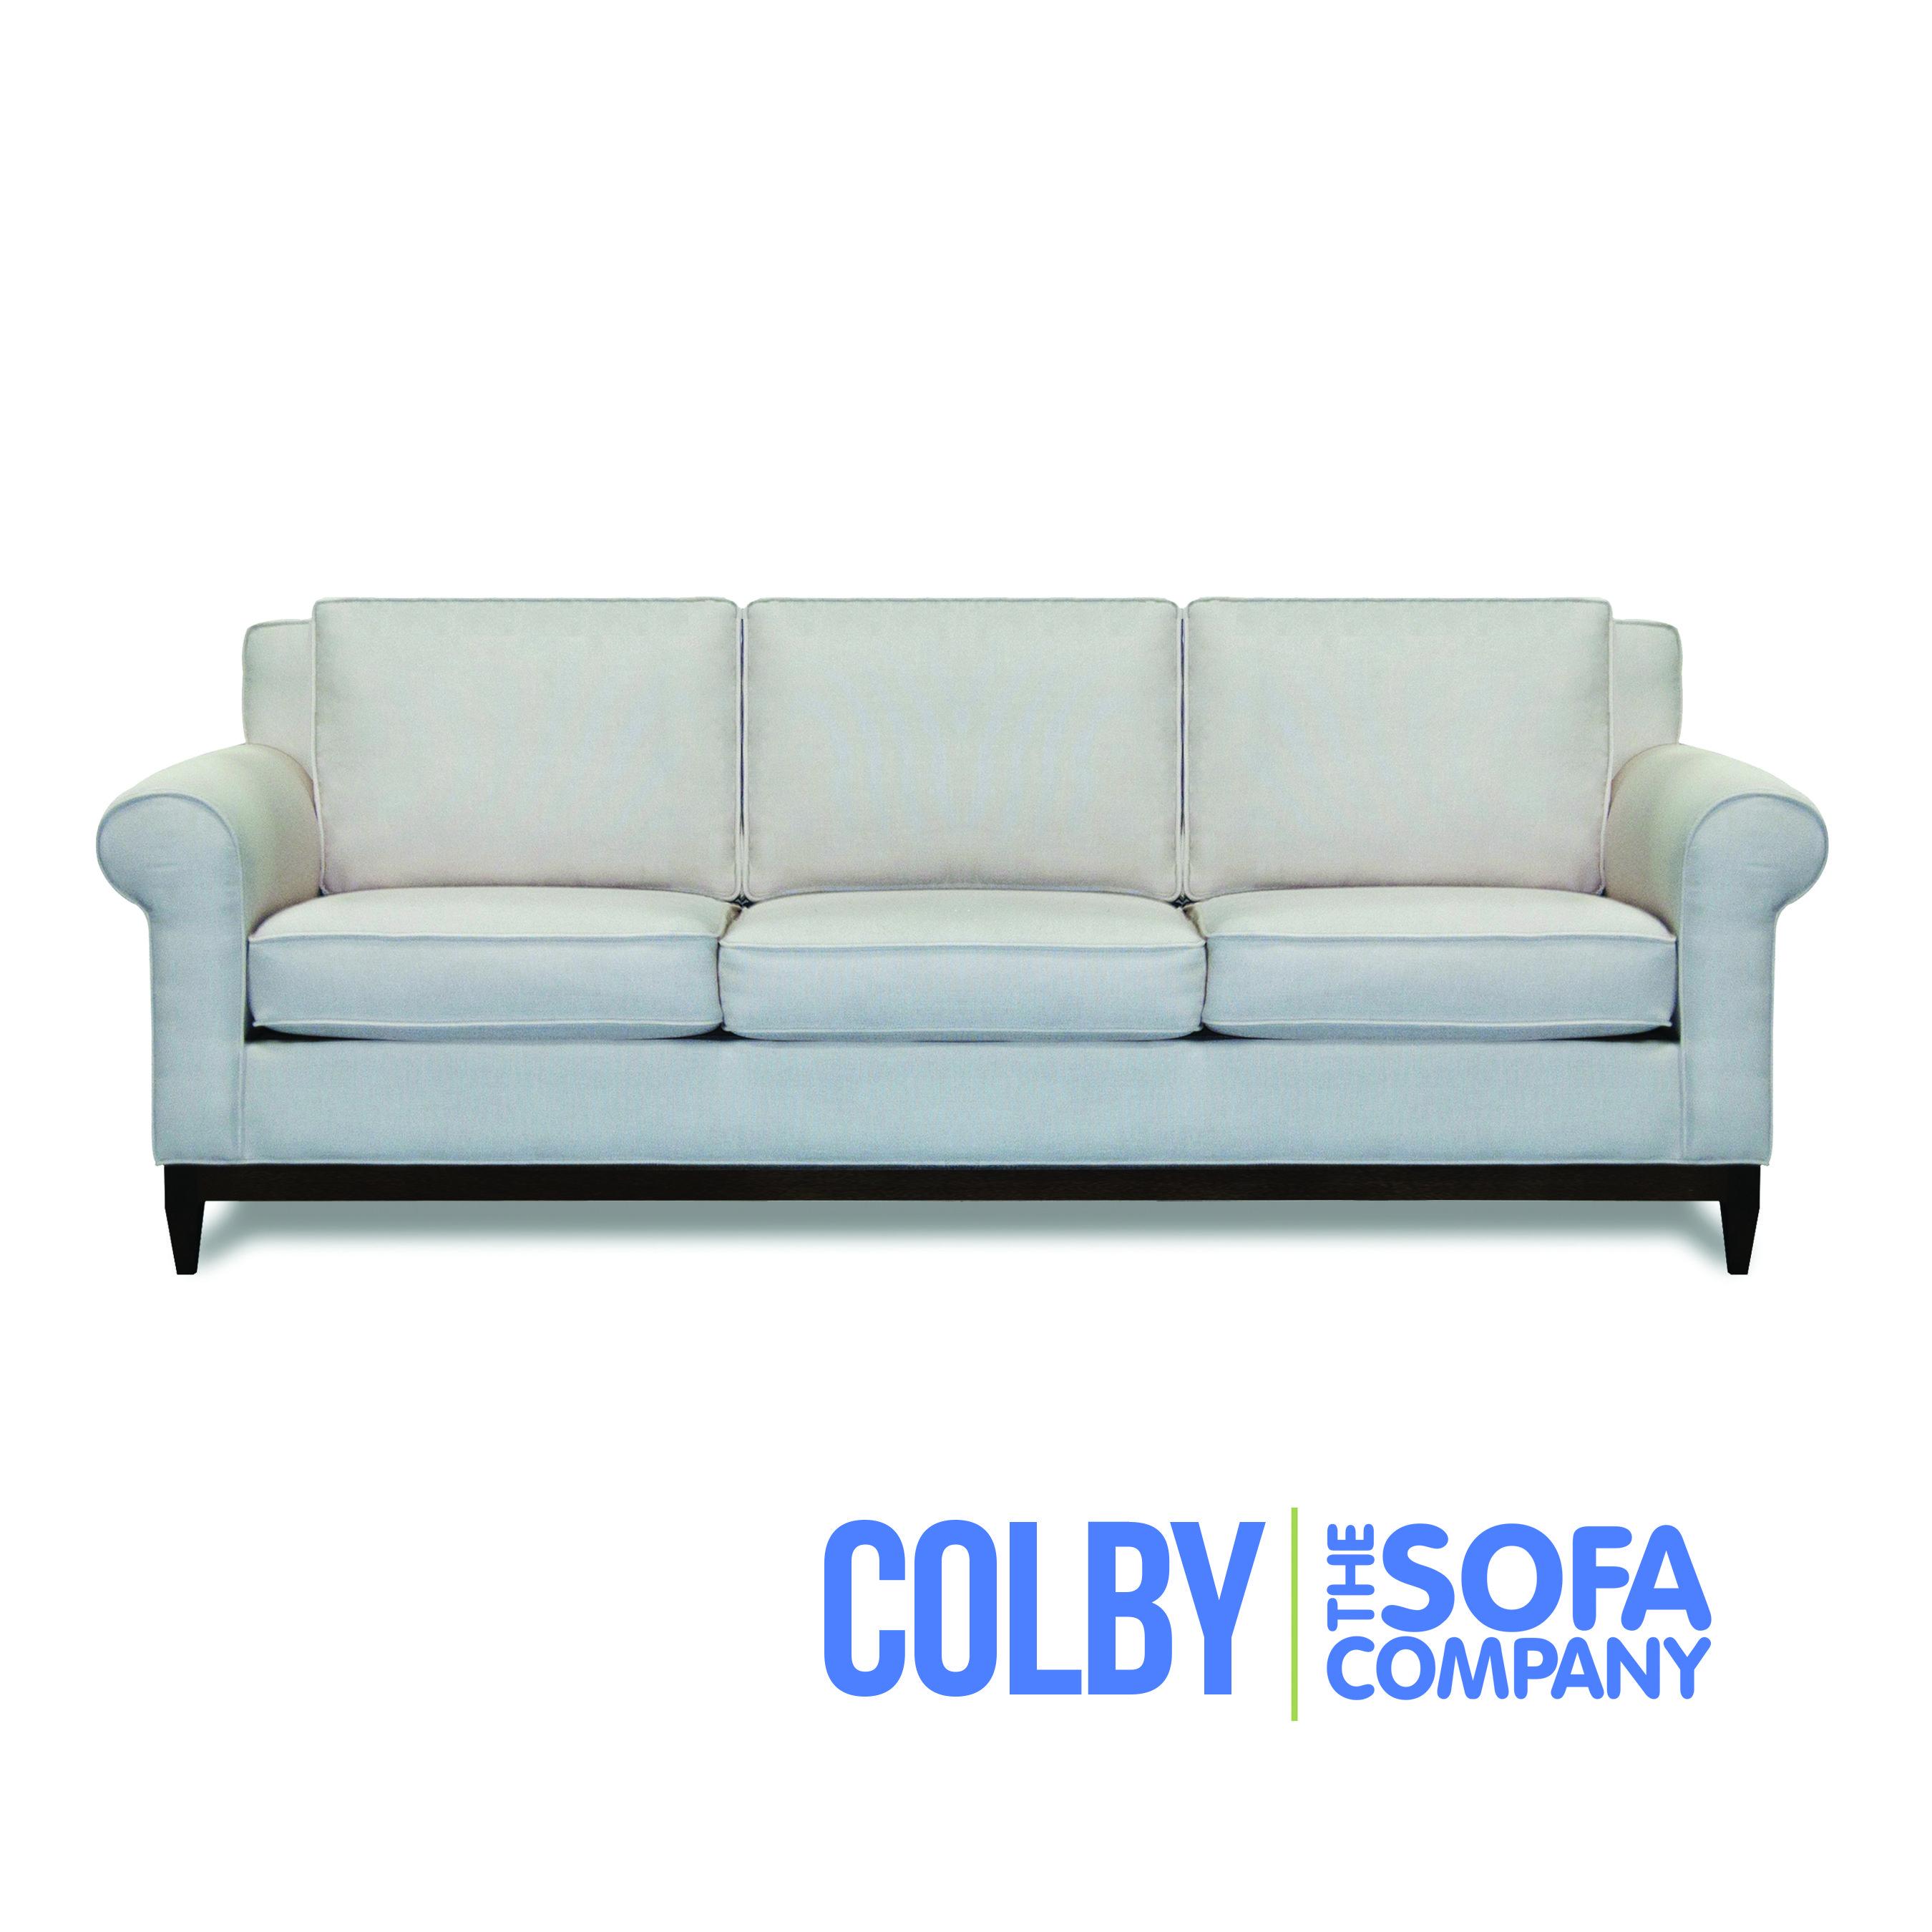 Montana Custom Furniture Company